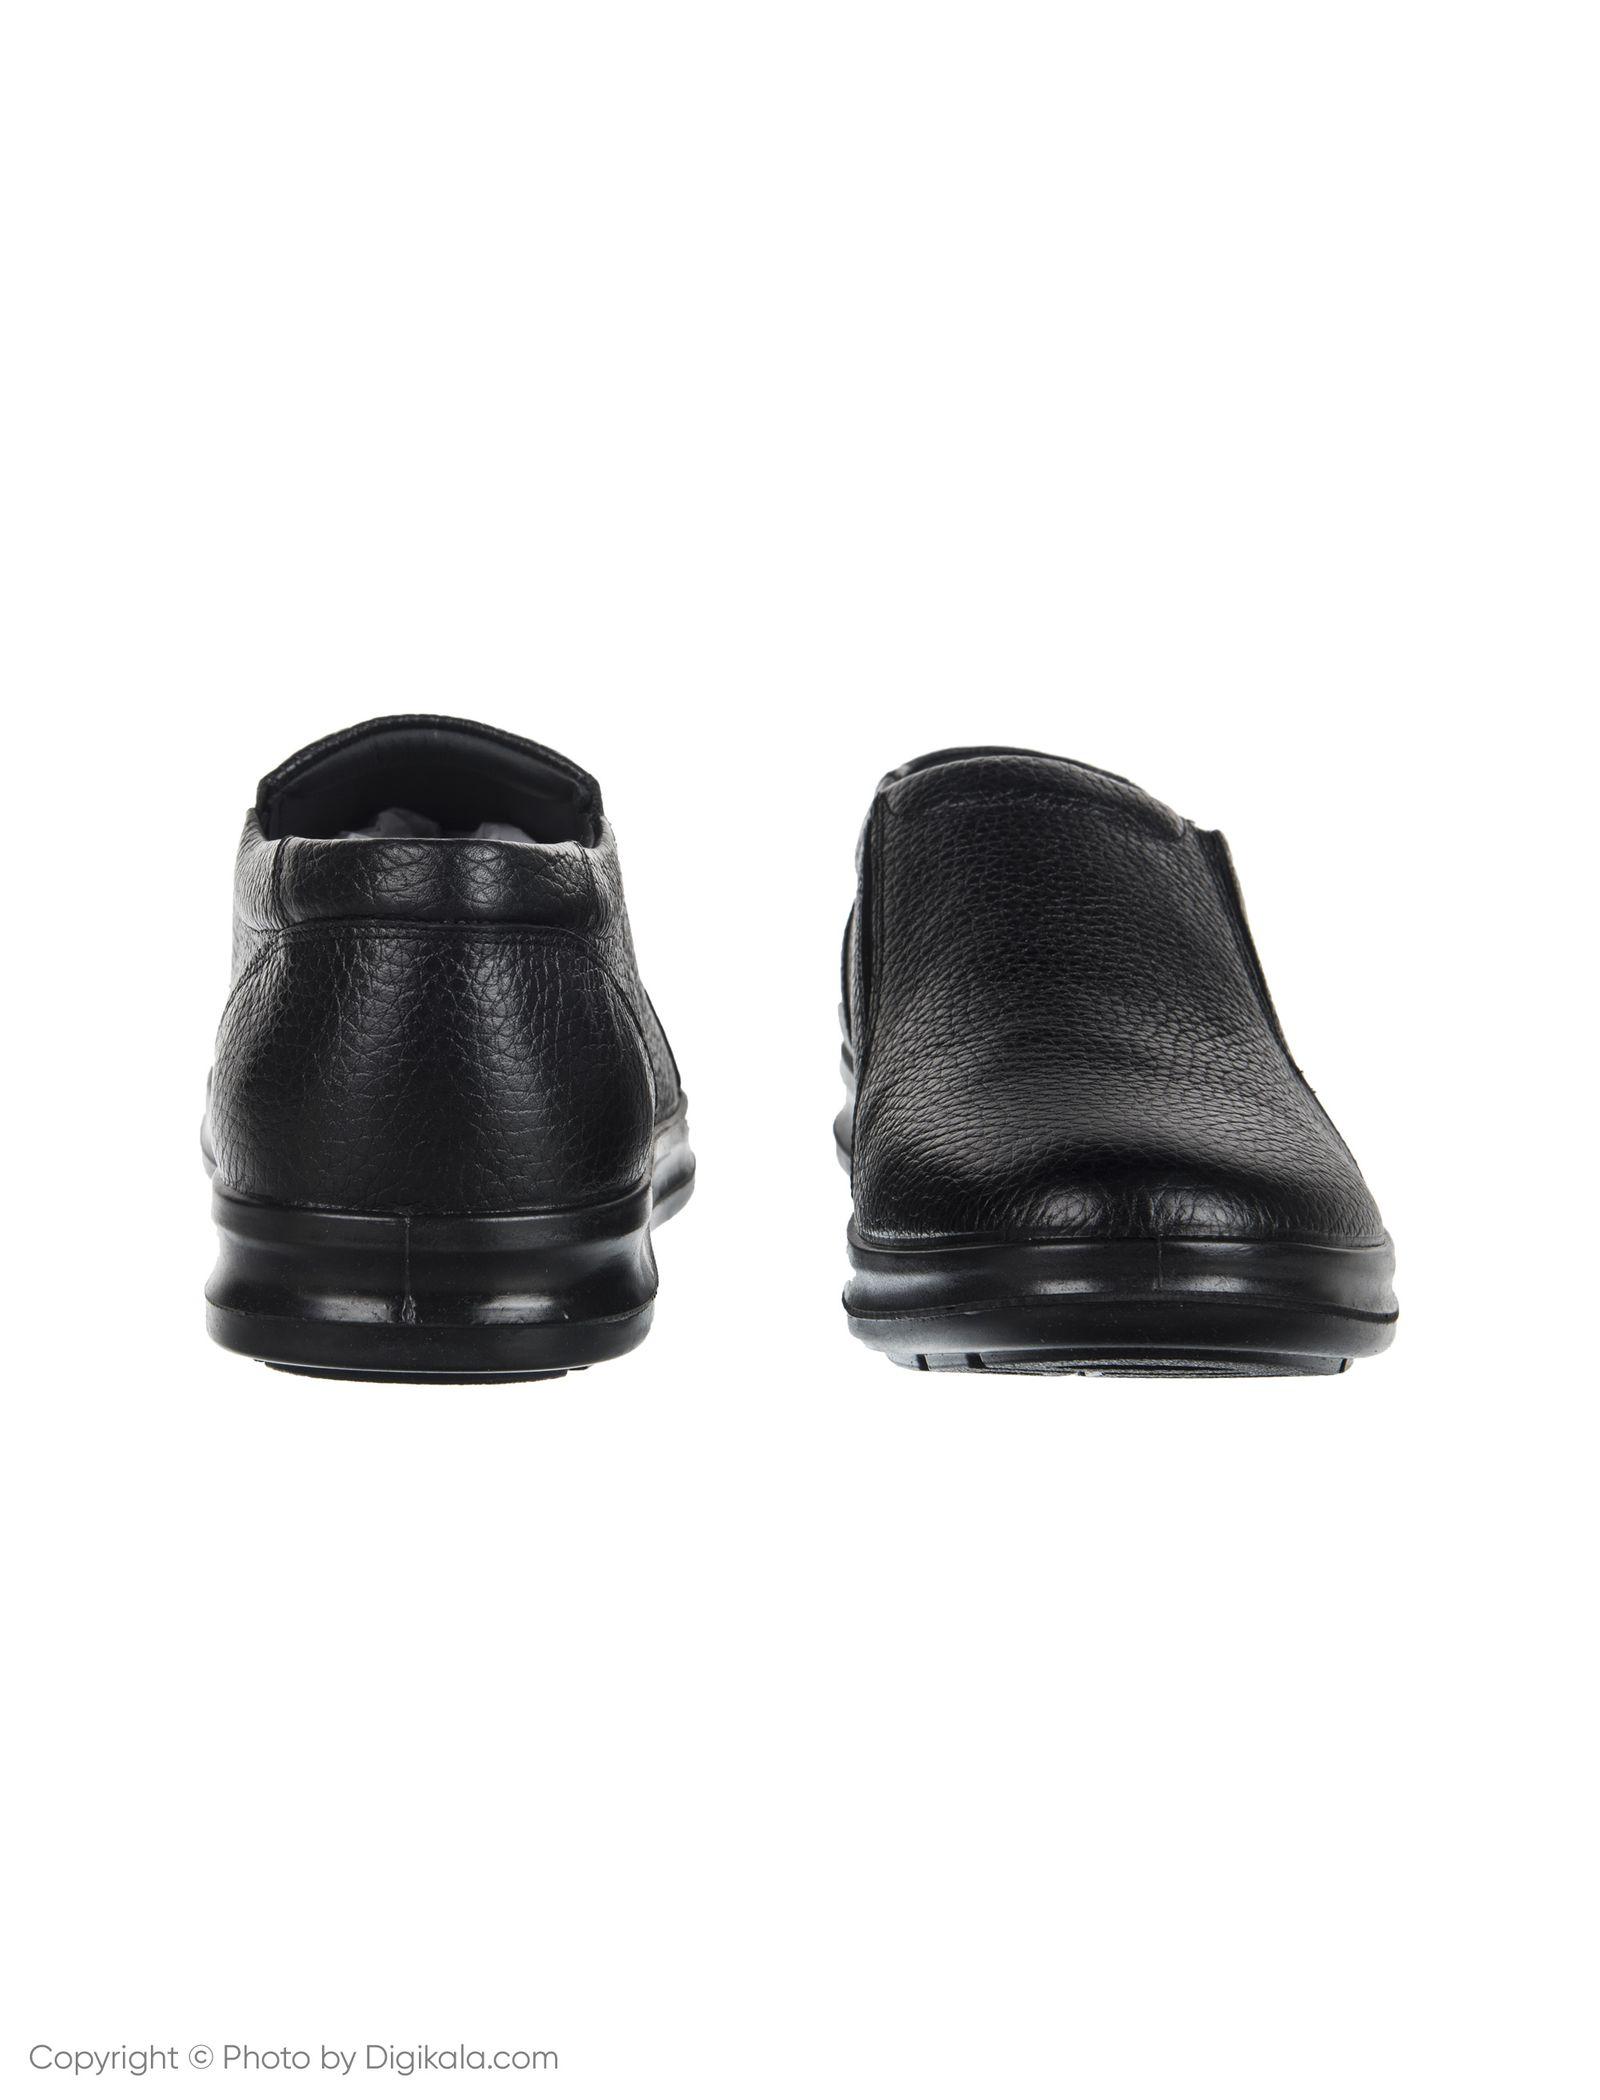 کفش مردانه دنیلی مدل 113110241002 -  - 5